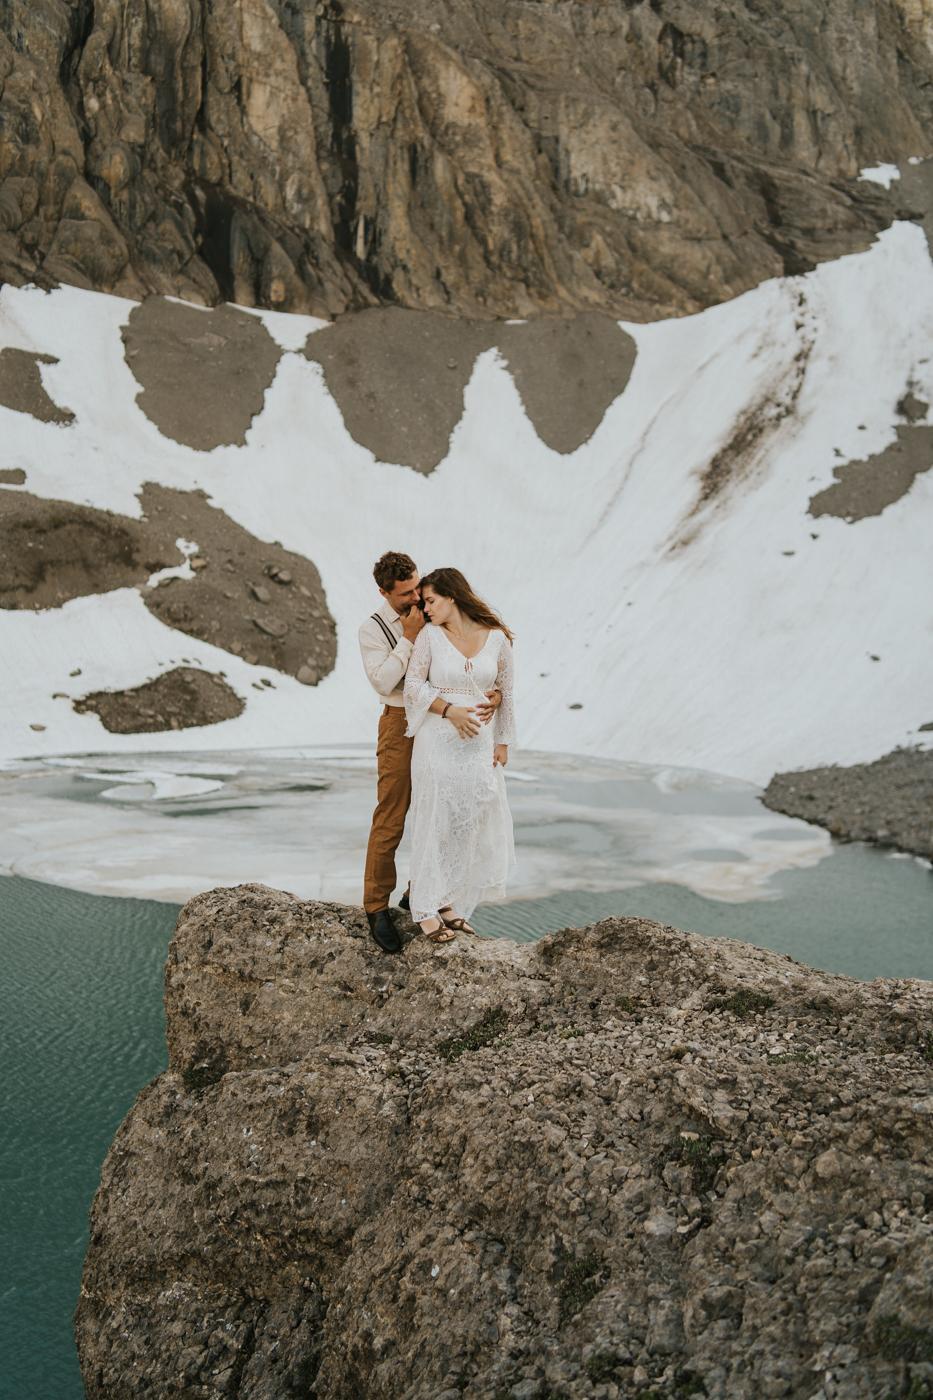 tyraephotography_photographer_wedding_elopement_engagement_photography-07797.jpg